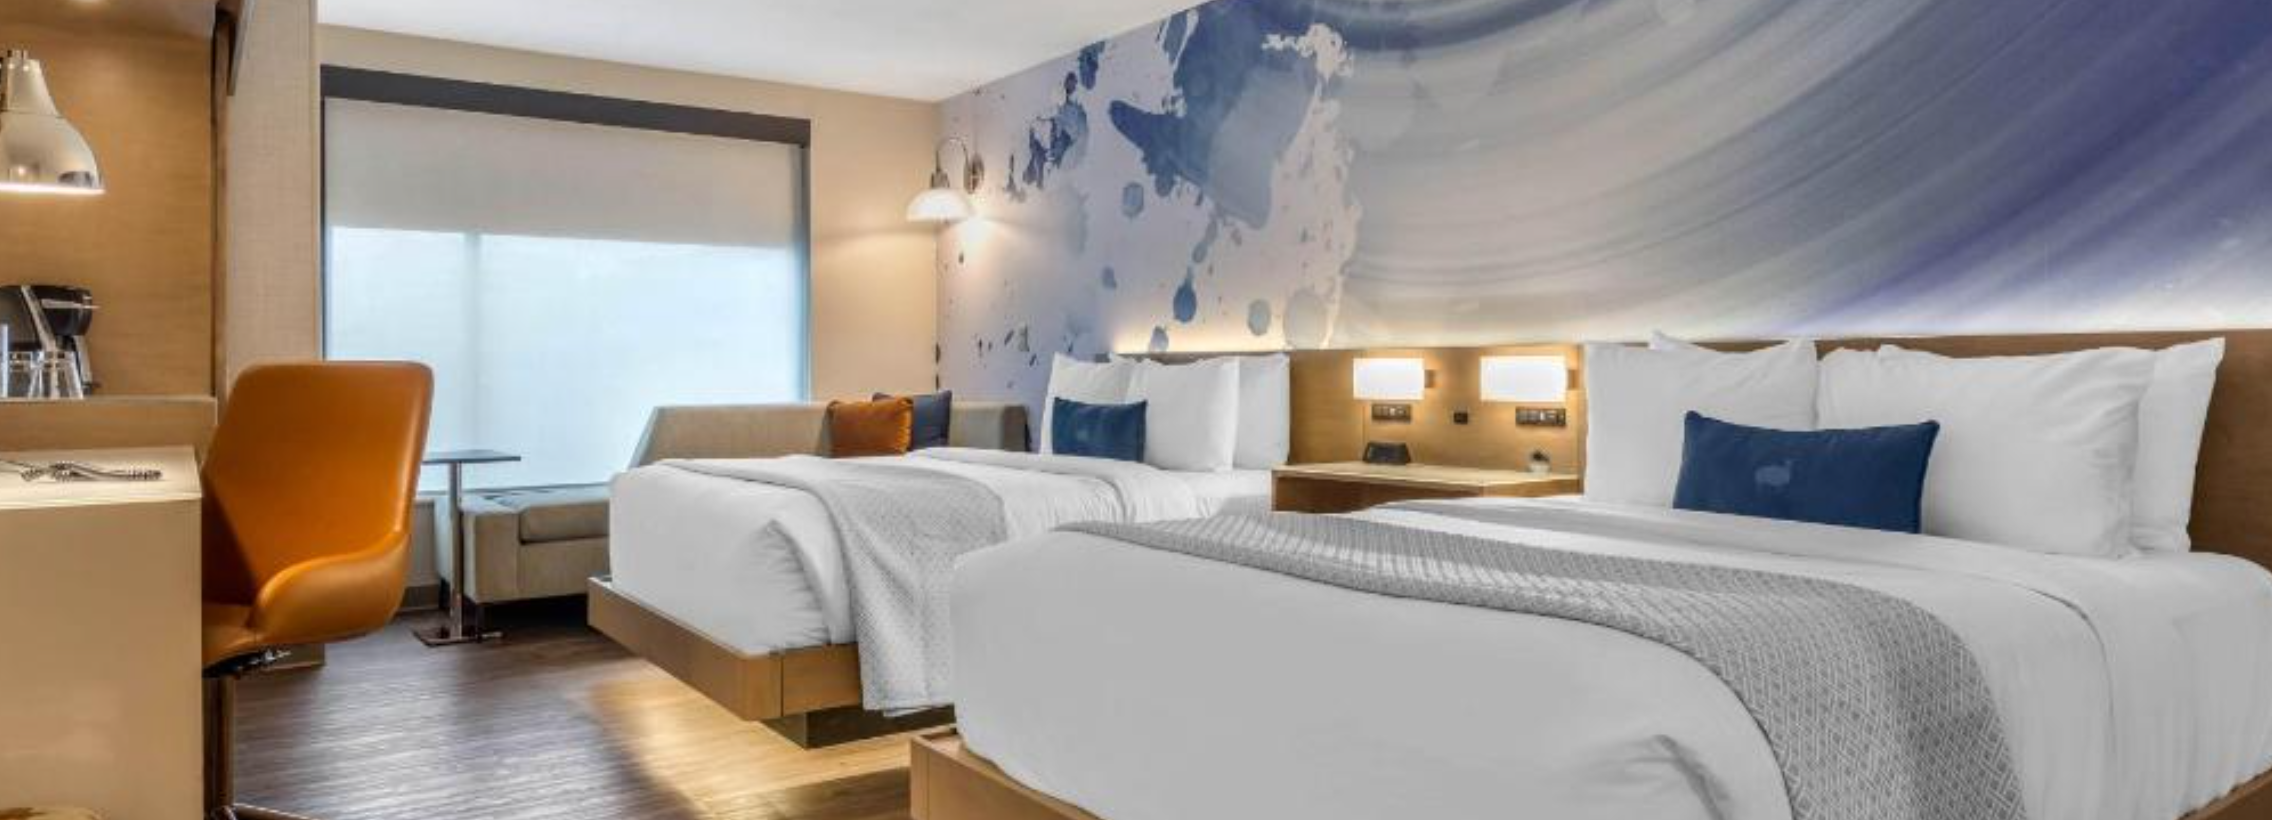 https://www.hotelsbyday.com/_data/default-hotel_image/3/18831/screenshot-2020-06-15-at-12-44-33-pm.png